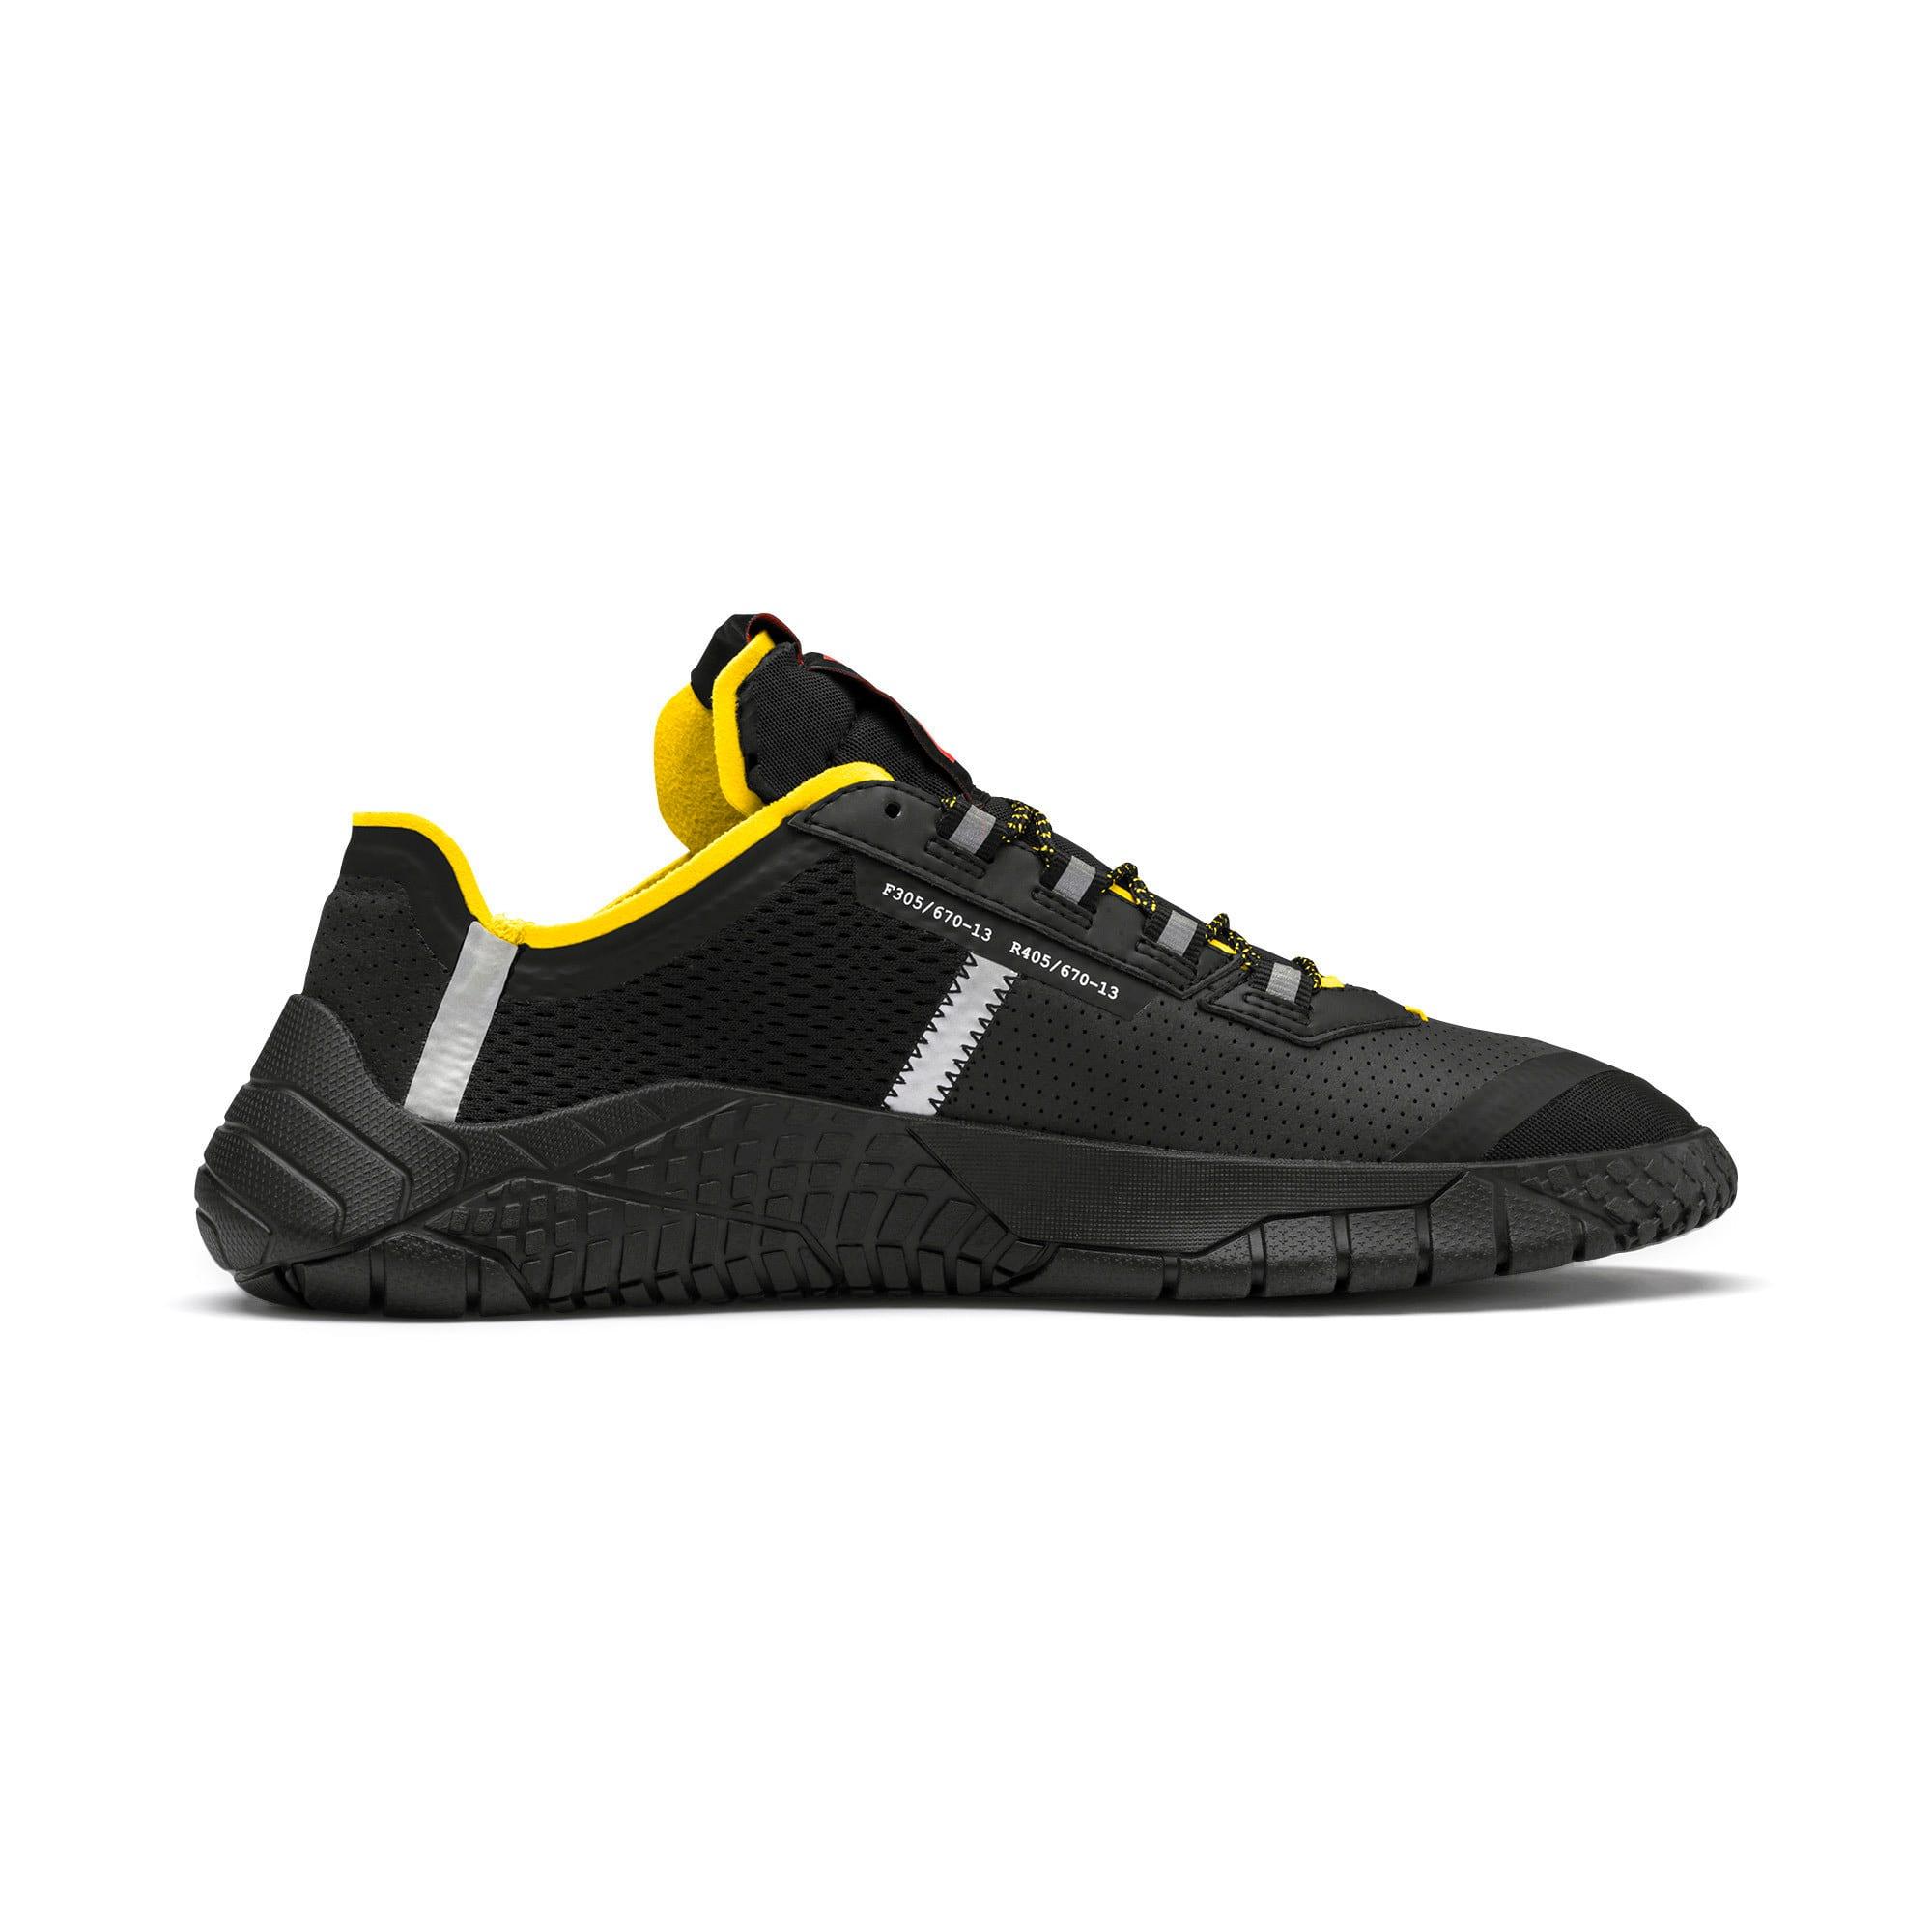 Thumbnail 5 of Pirelli Replicat-X Trainers, Black-Black-Cyber Yellow, medium